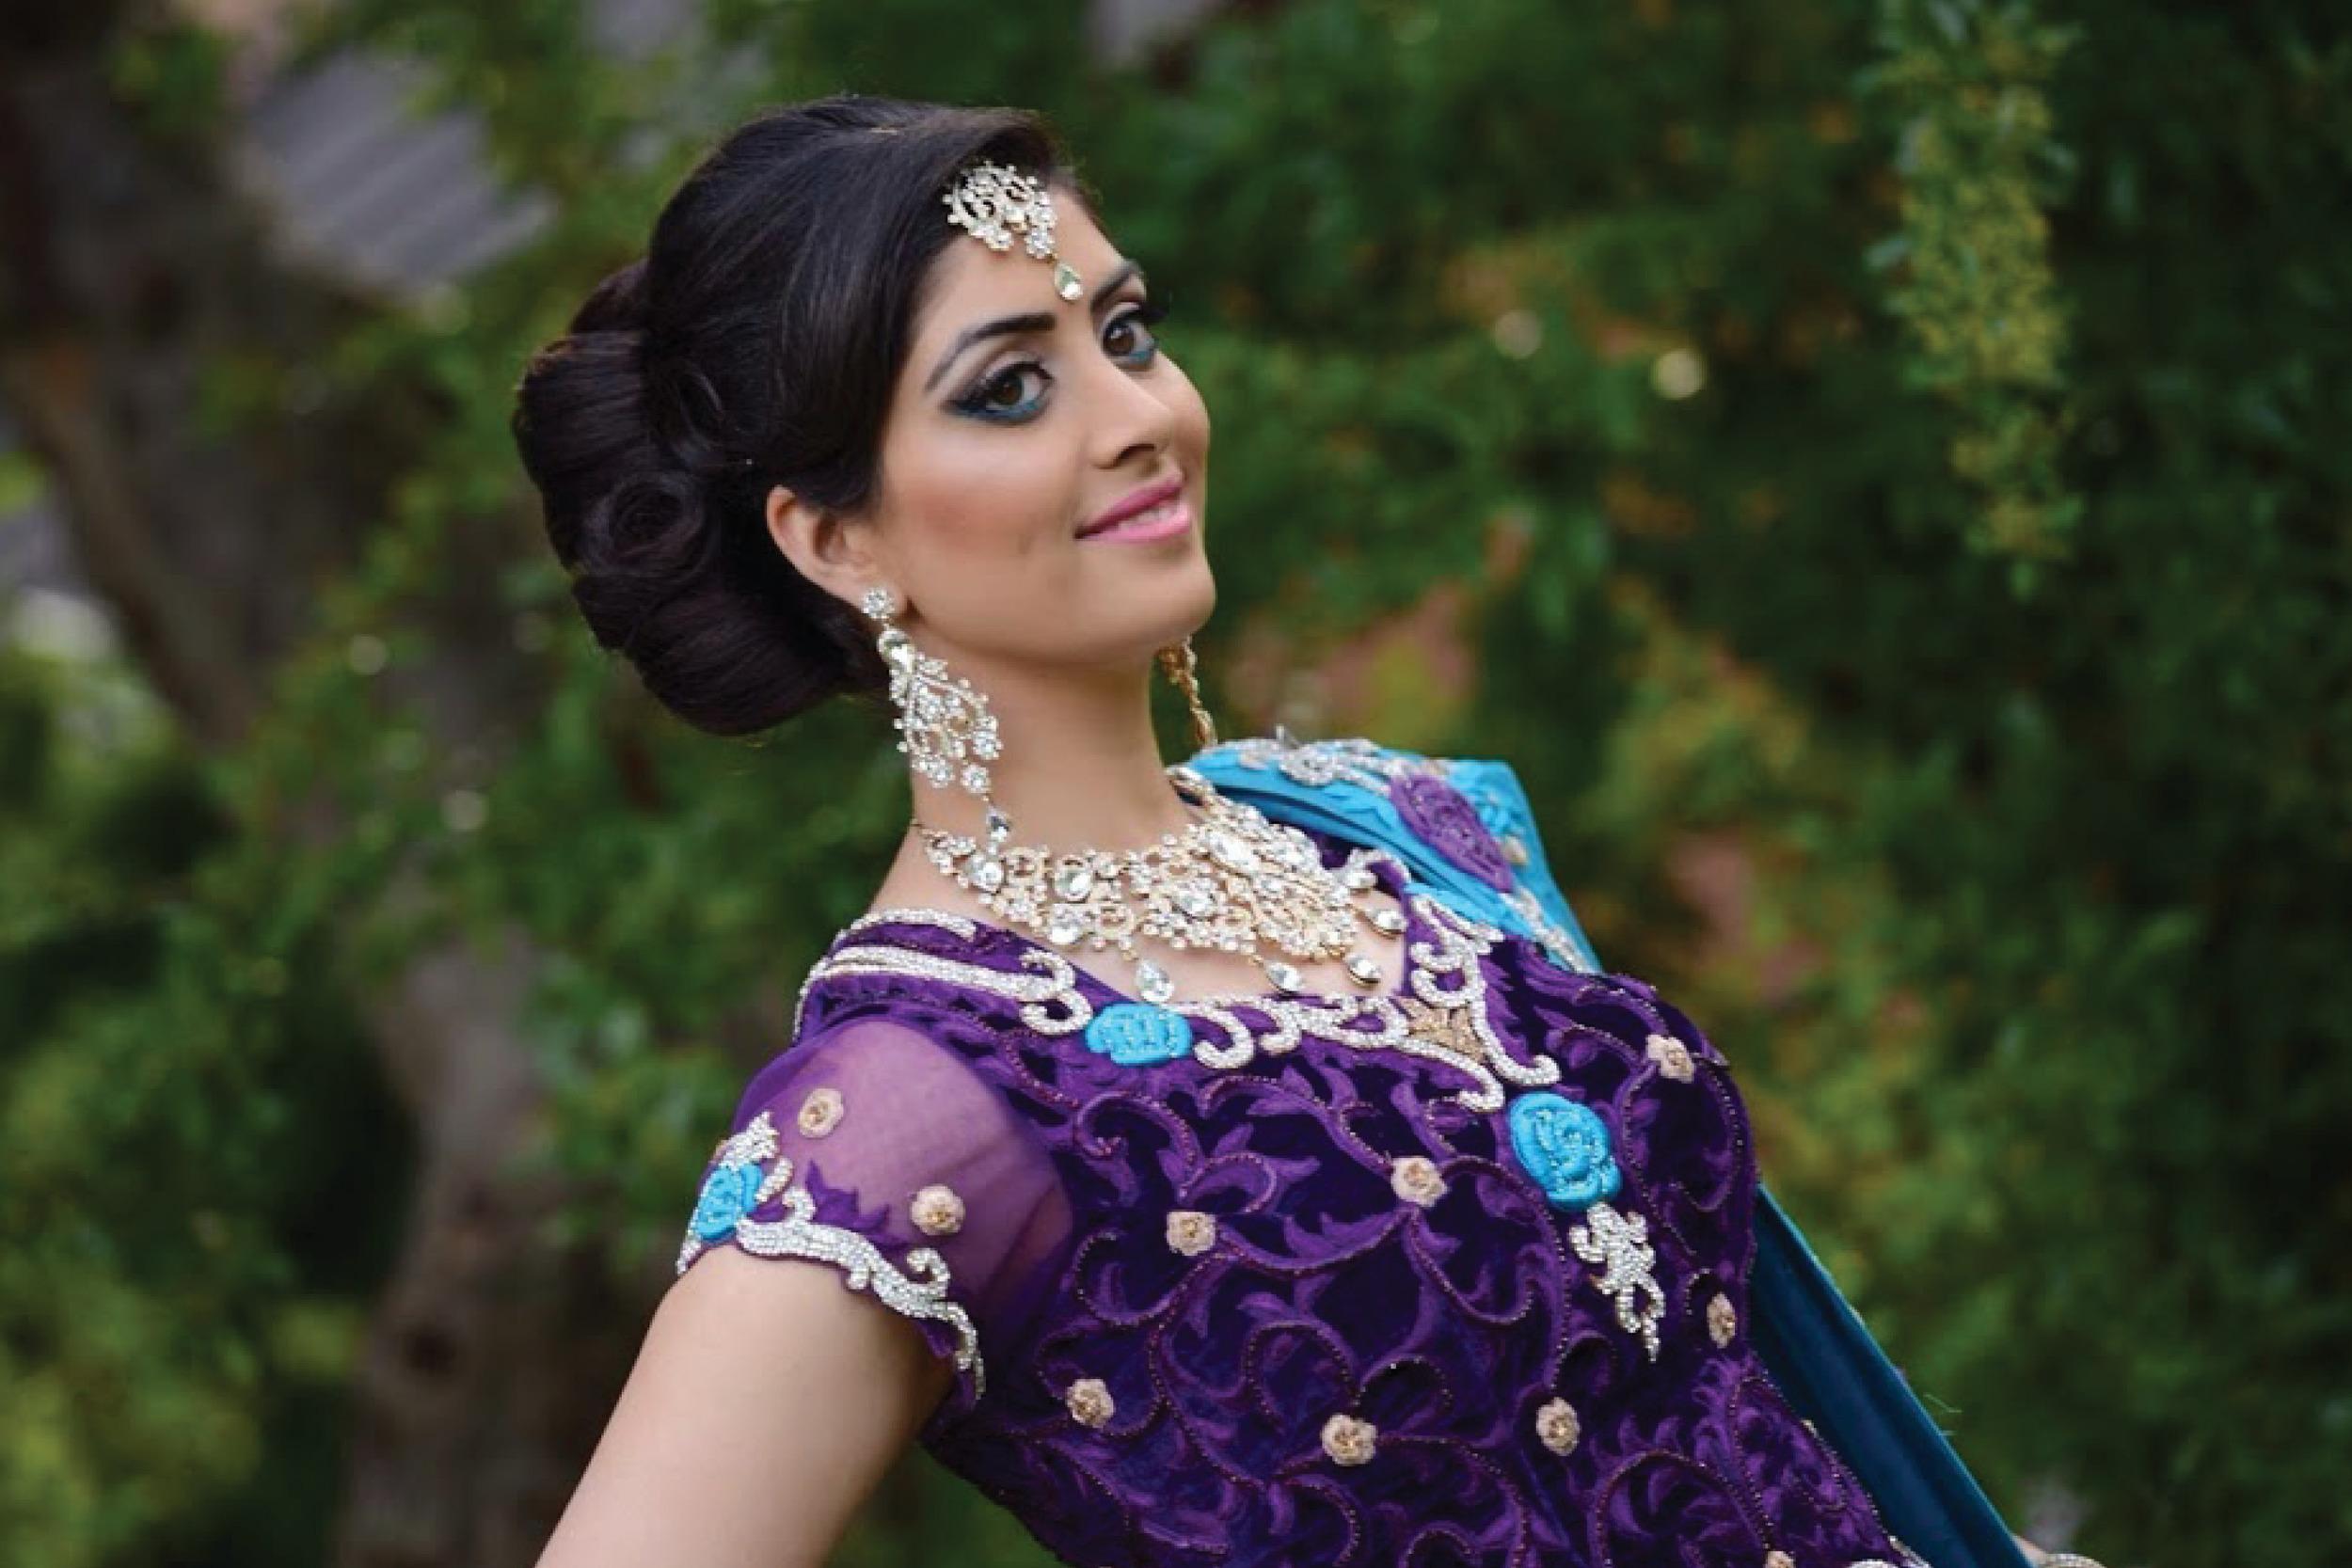 Bridal-makeup-image-234.jpg